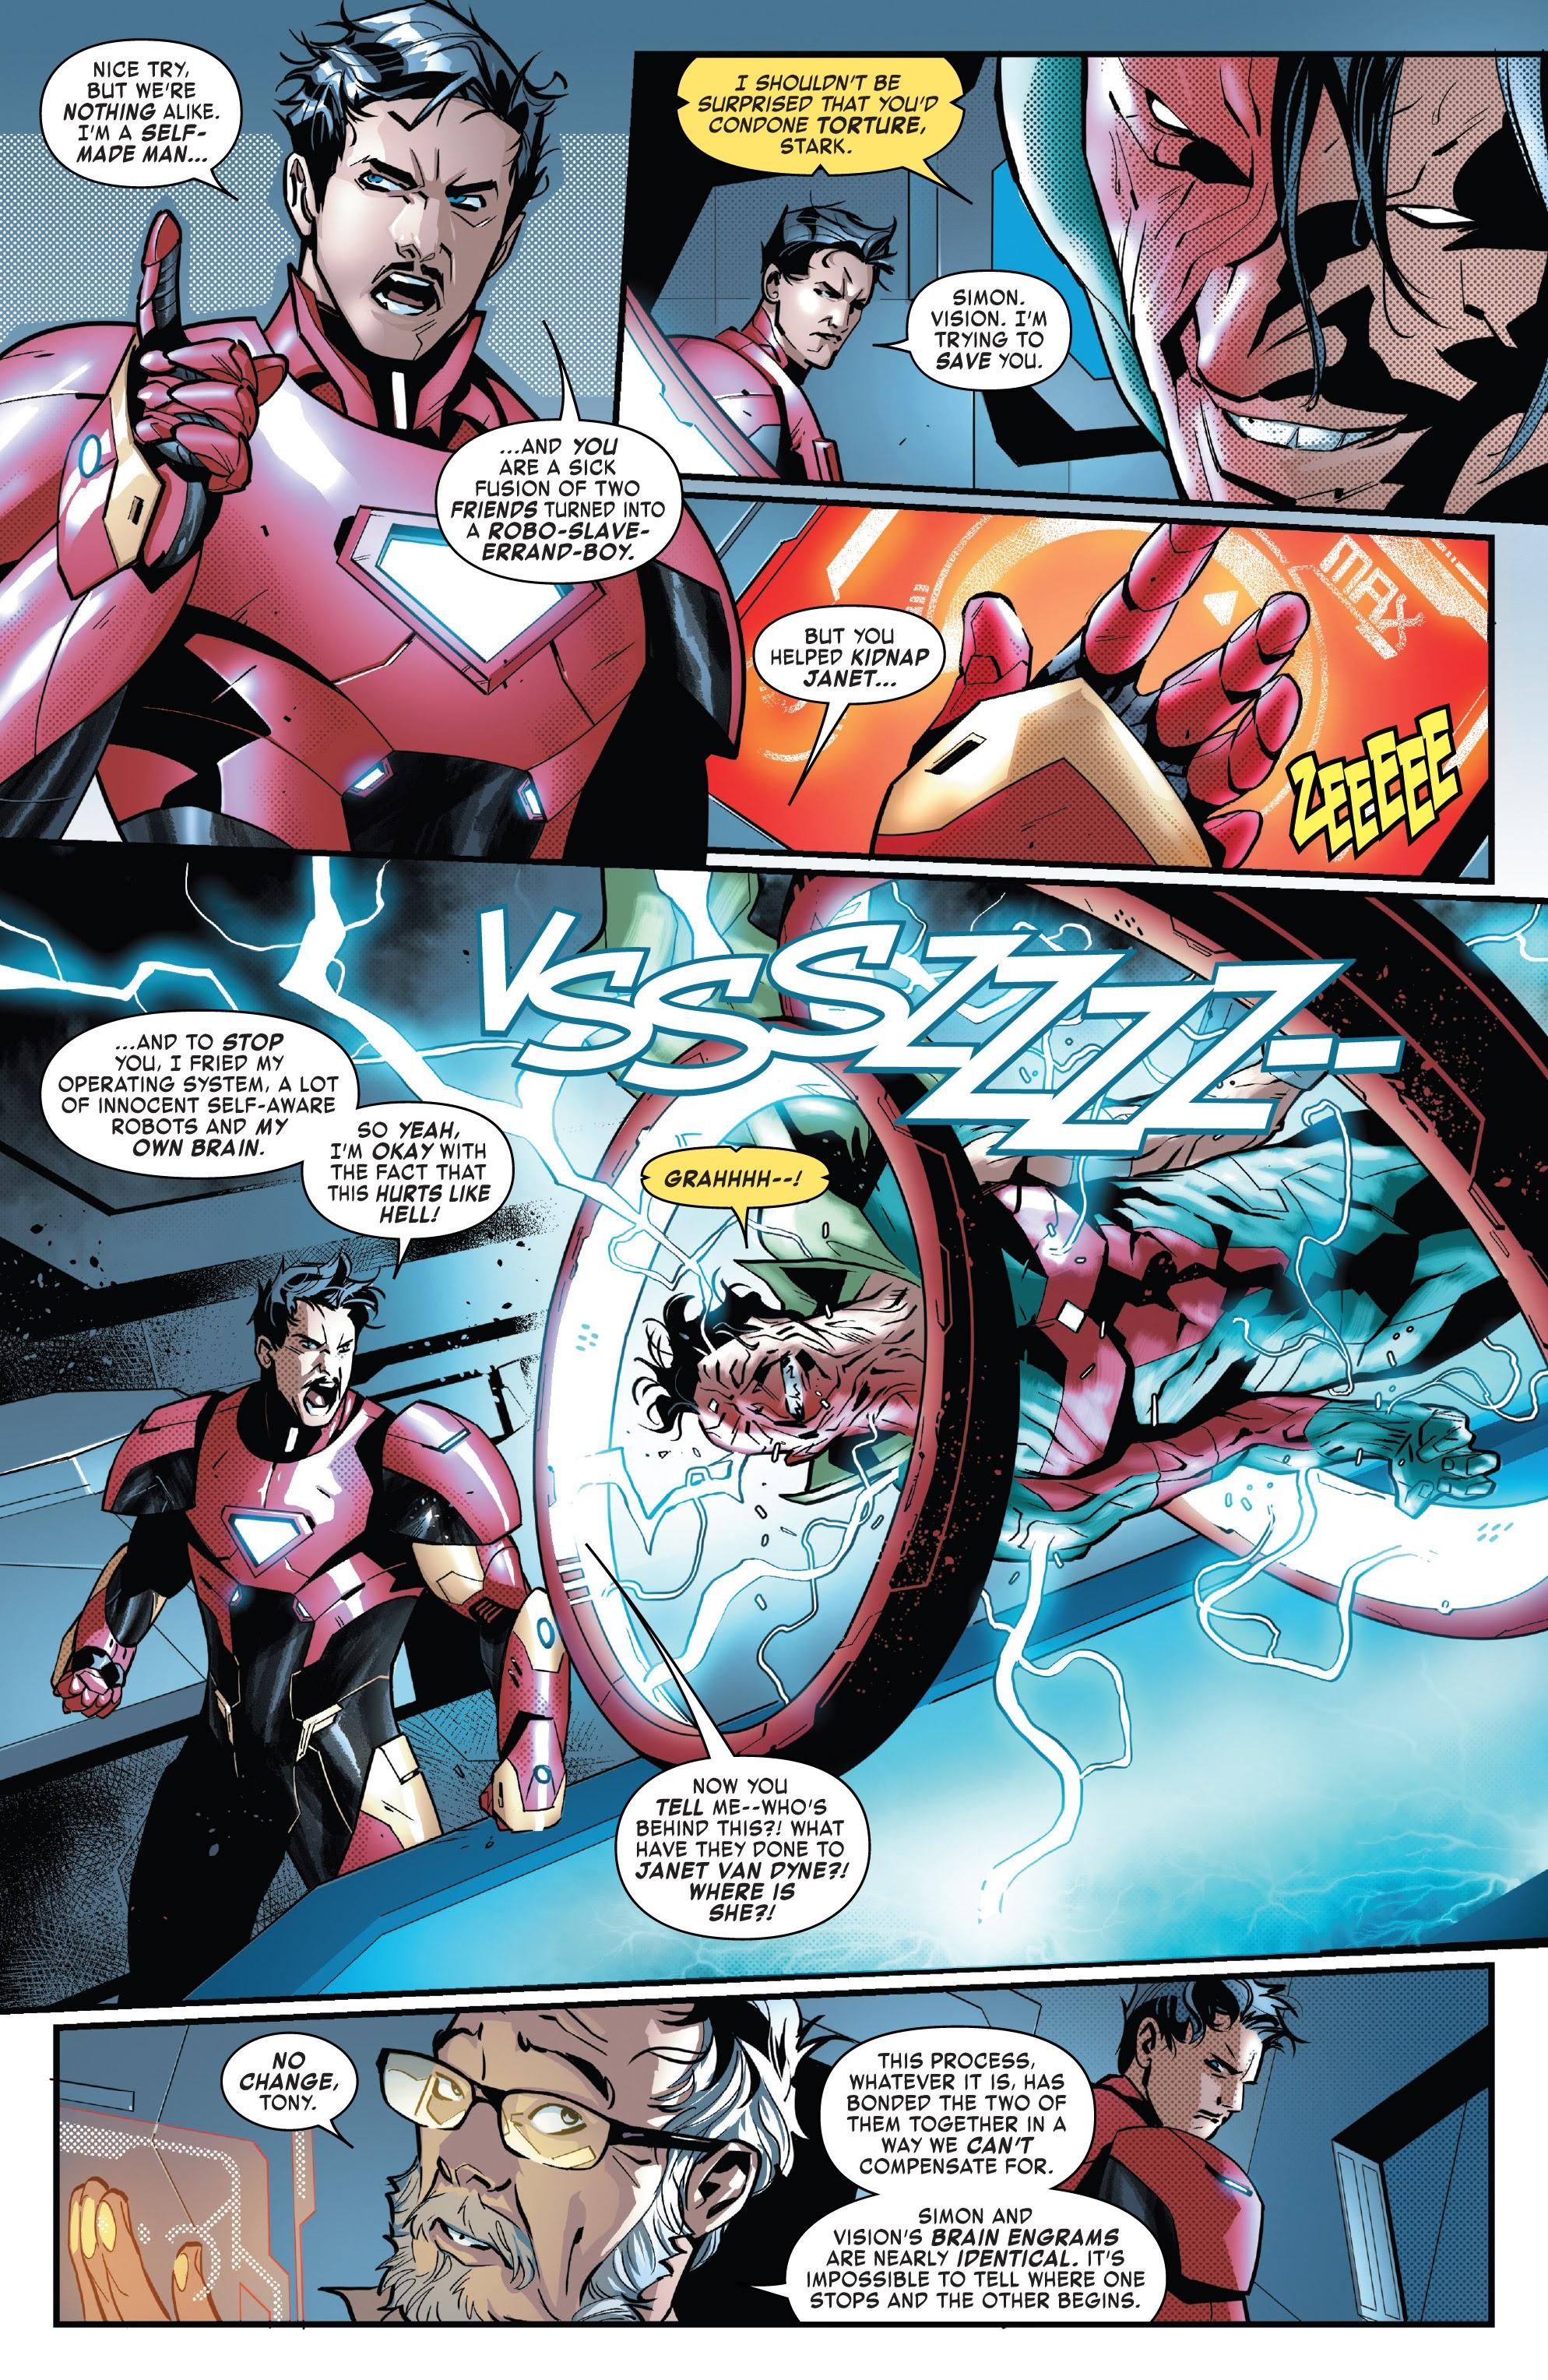 Read online Tony Stark: Iron Man comic -  Issue #16 - 6